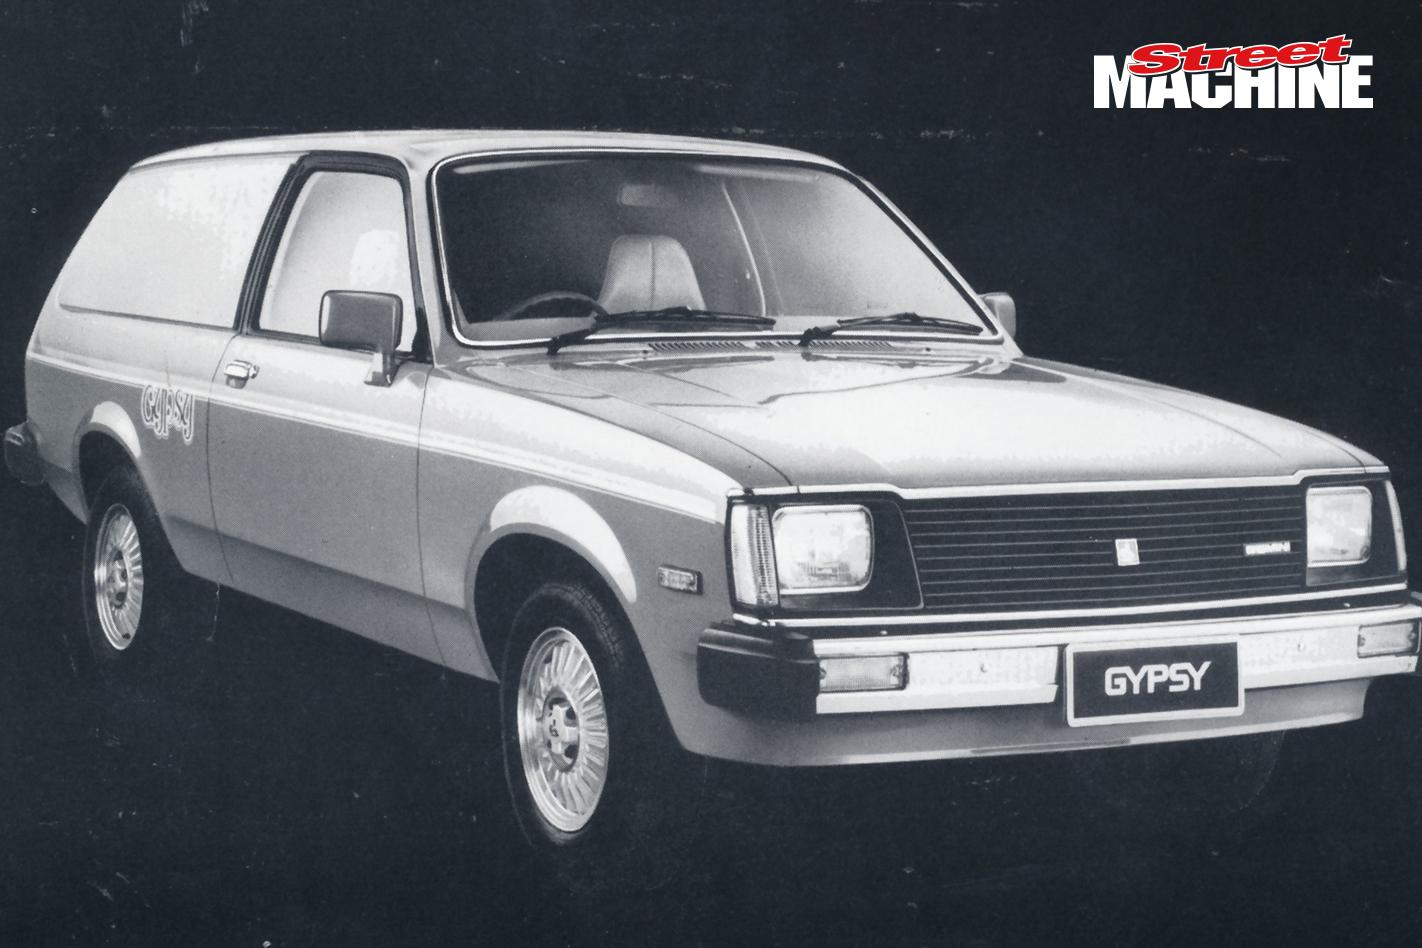 Holden Gemini Gypsy Panel Van